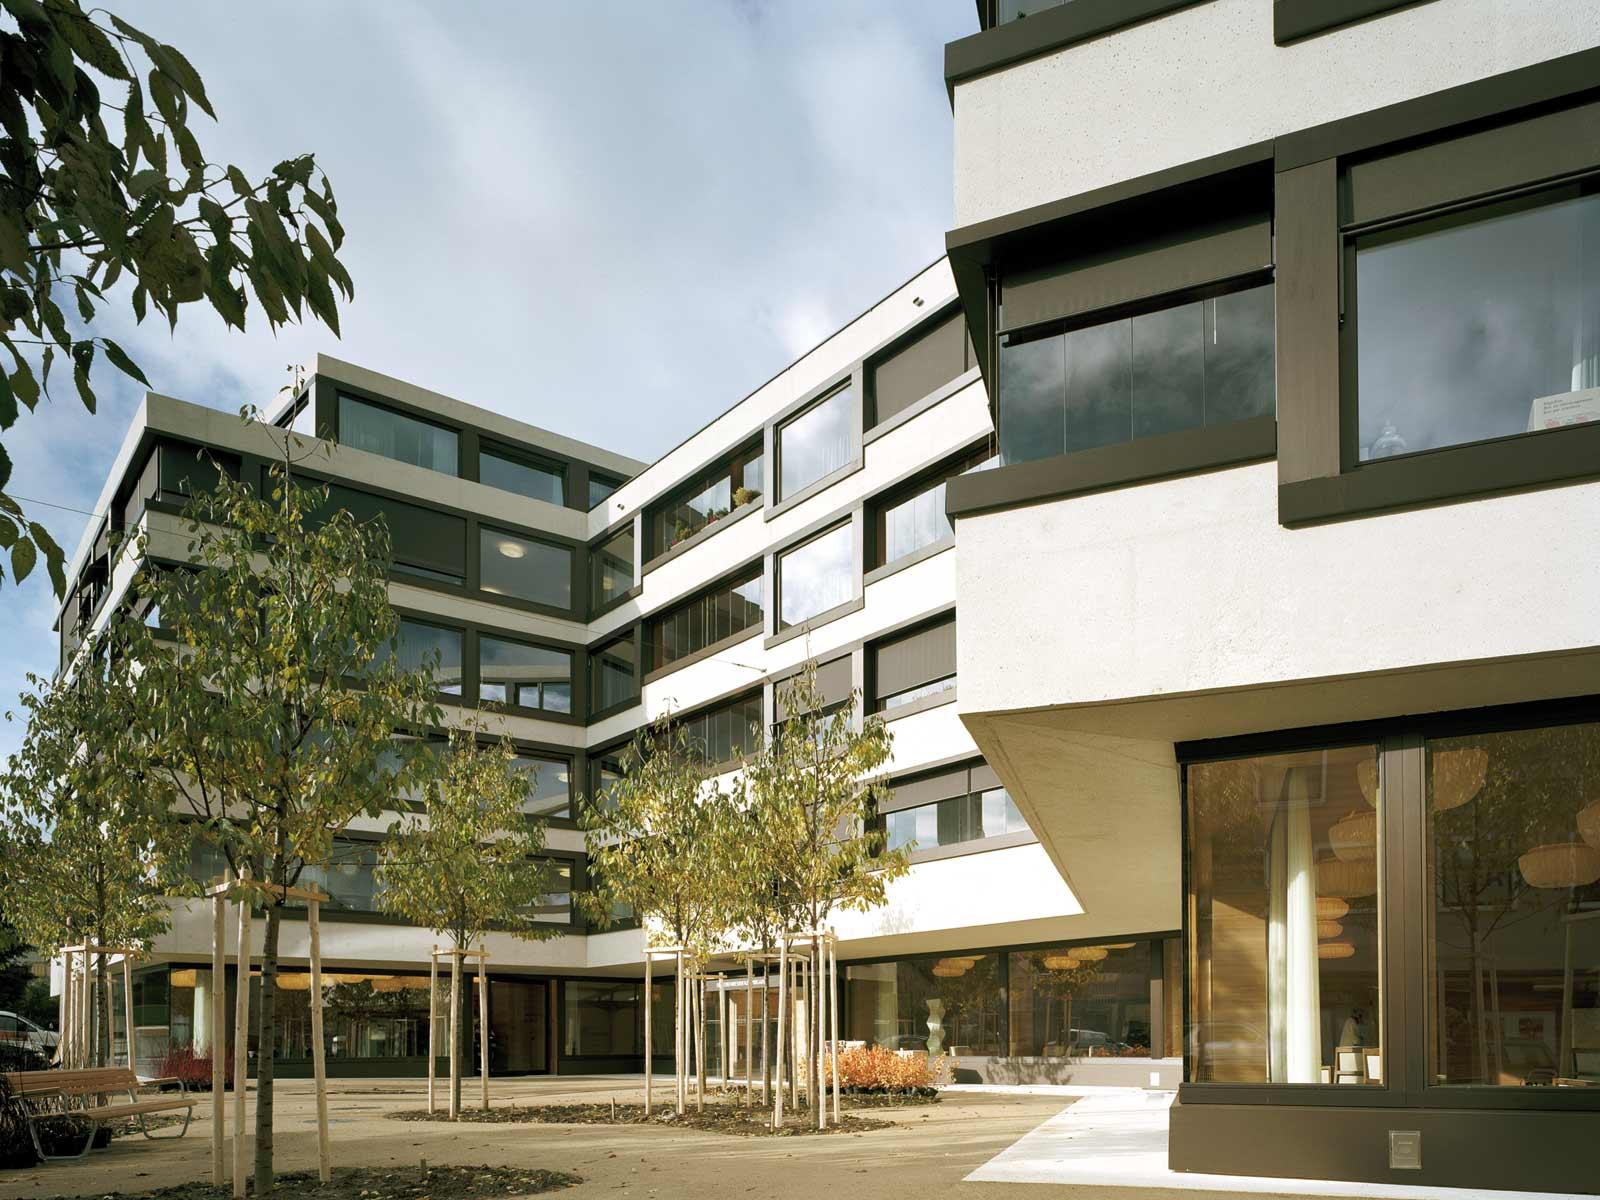 Best Architects Architektur Award Miller Maranta Miller Maranta Seniorenresidenz